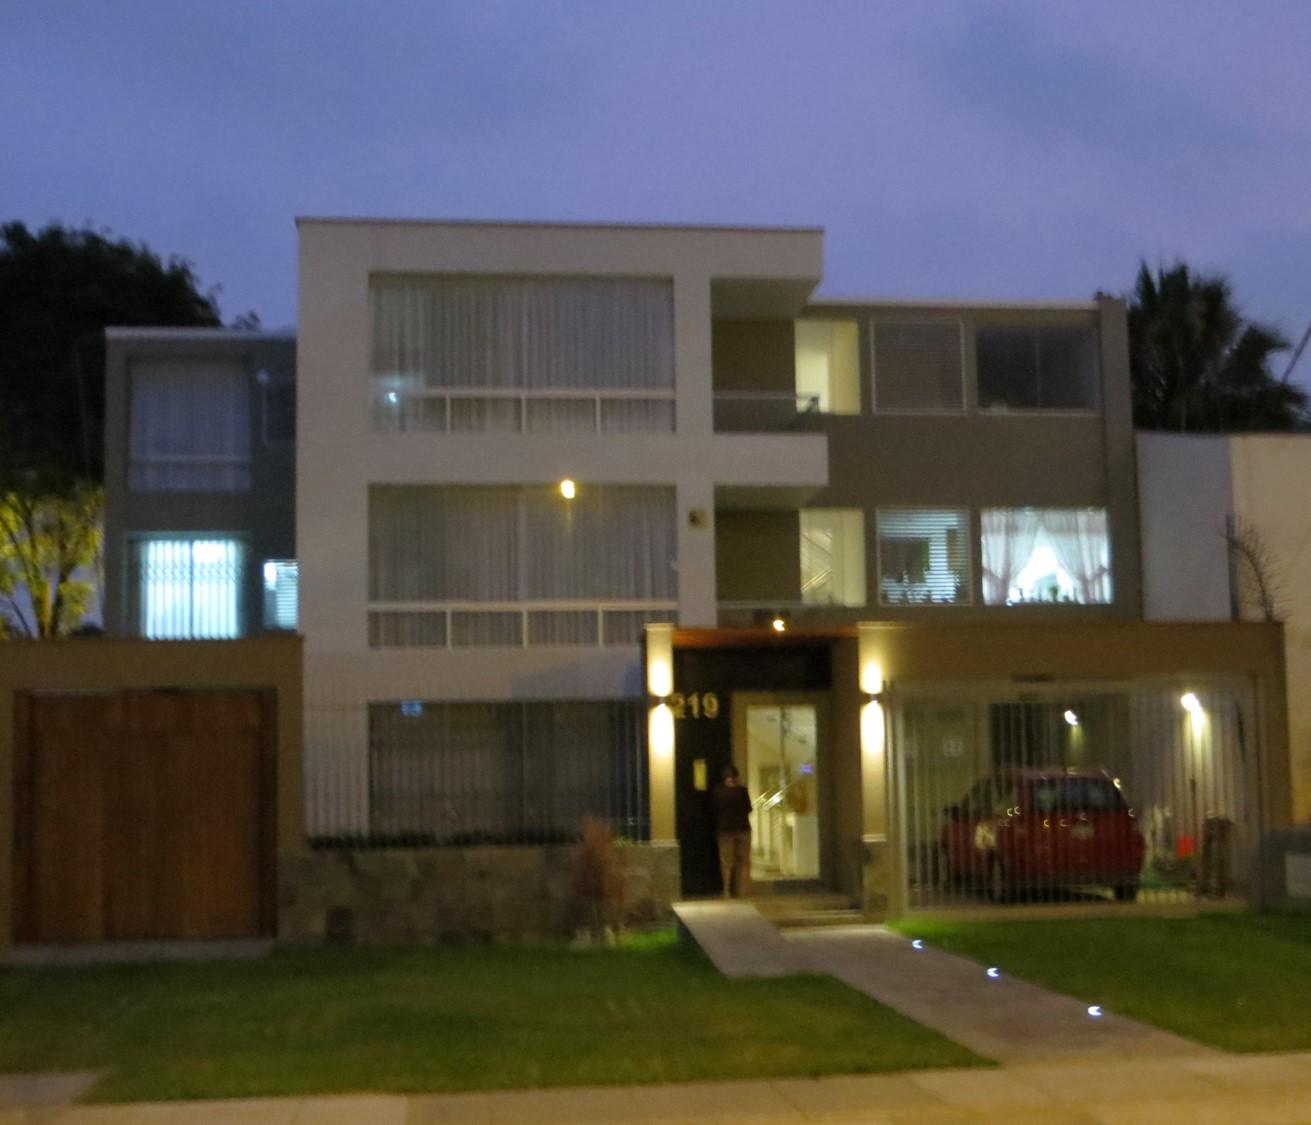 Fachadas Y Casas Moderna Casa De Tres Pisos